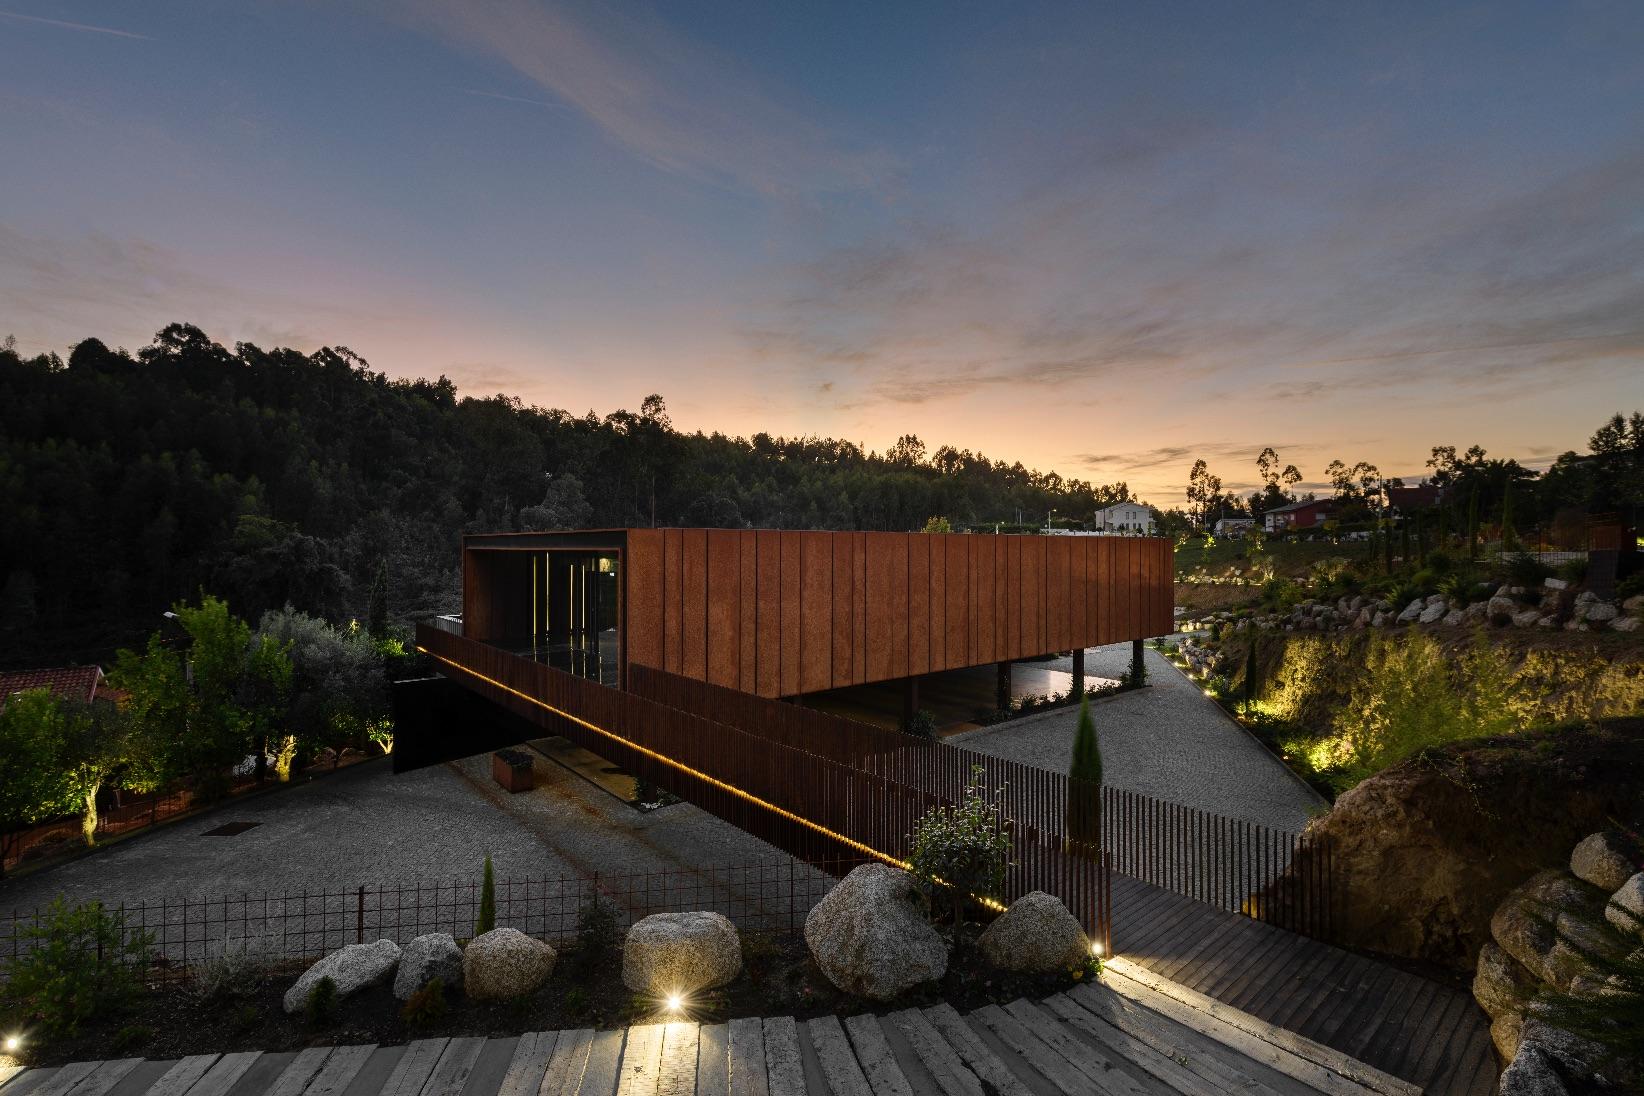 10_MMV Arquitectos_Suspended Matter Box_Inspirationist